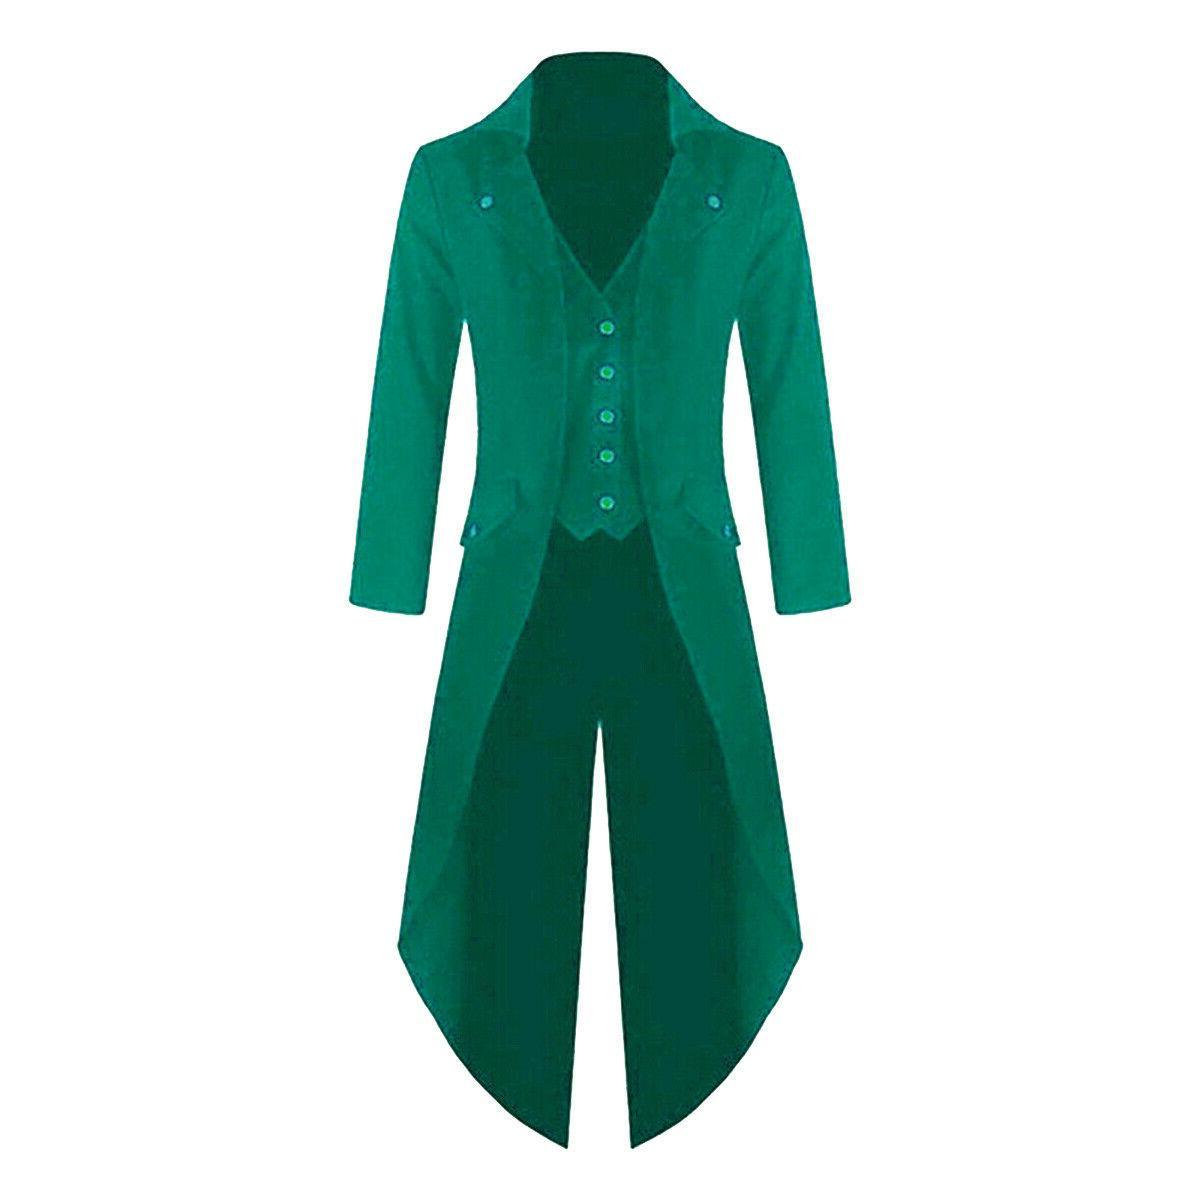 Mens Coat Tuxedo Banquet Tail Overcoat